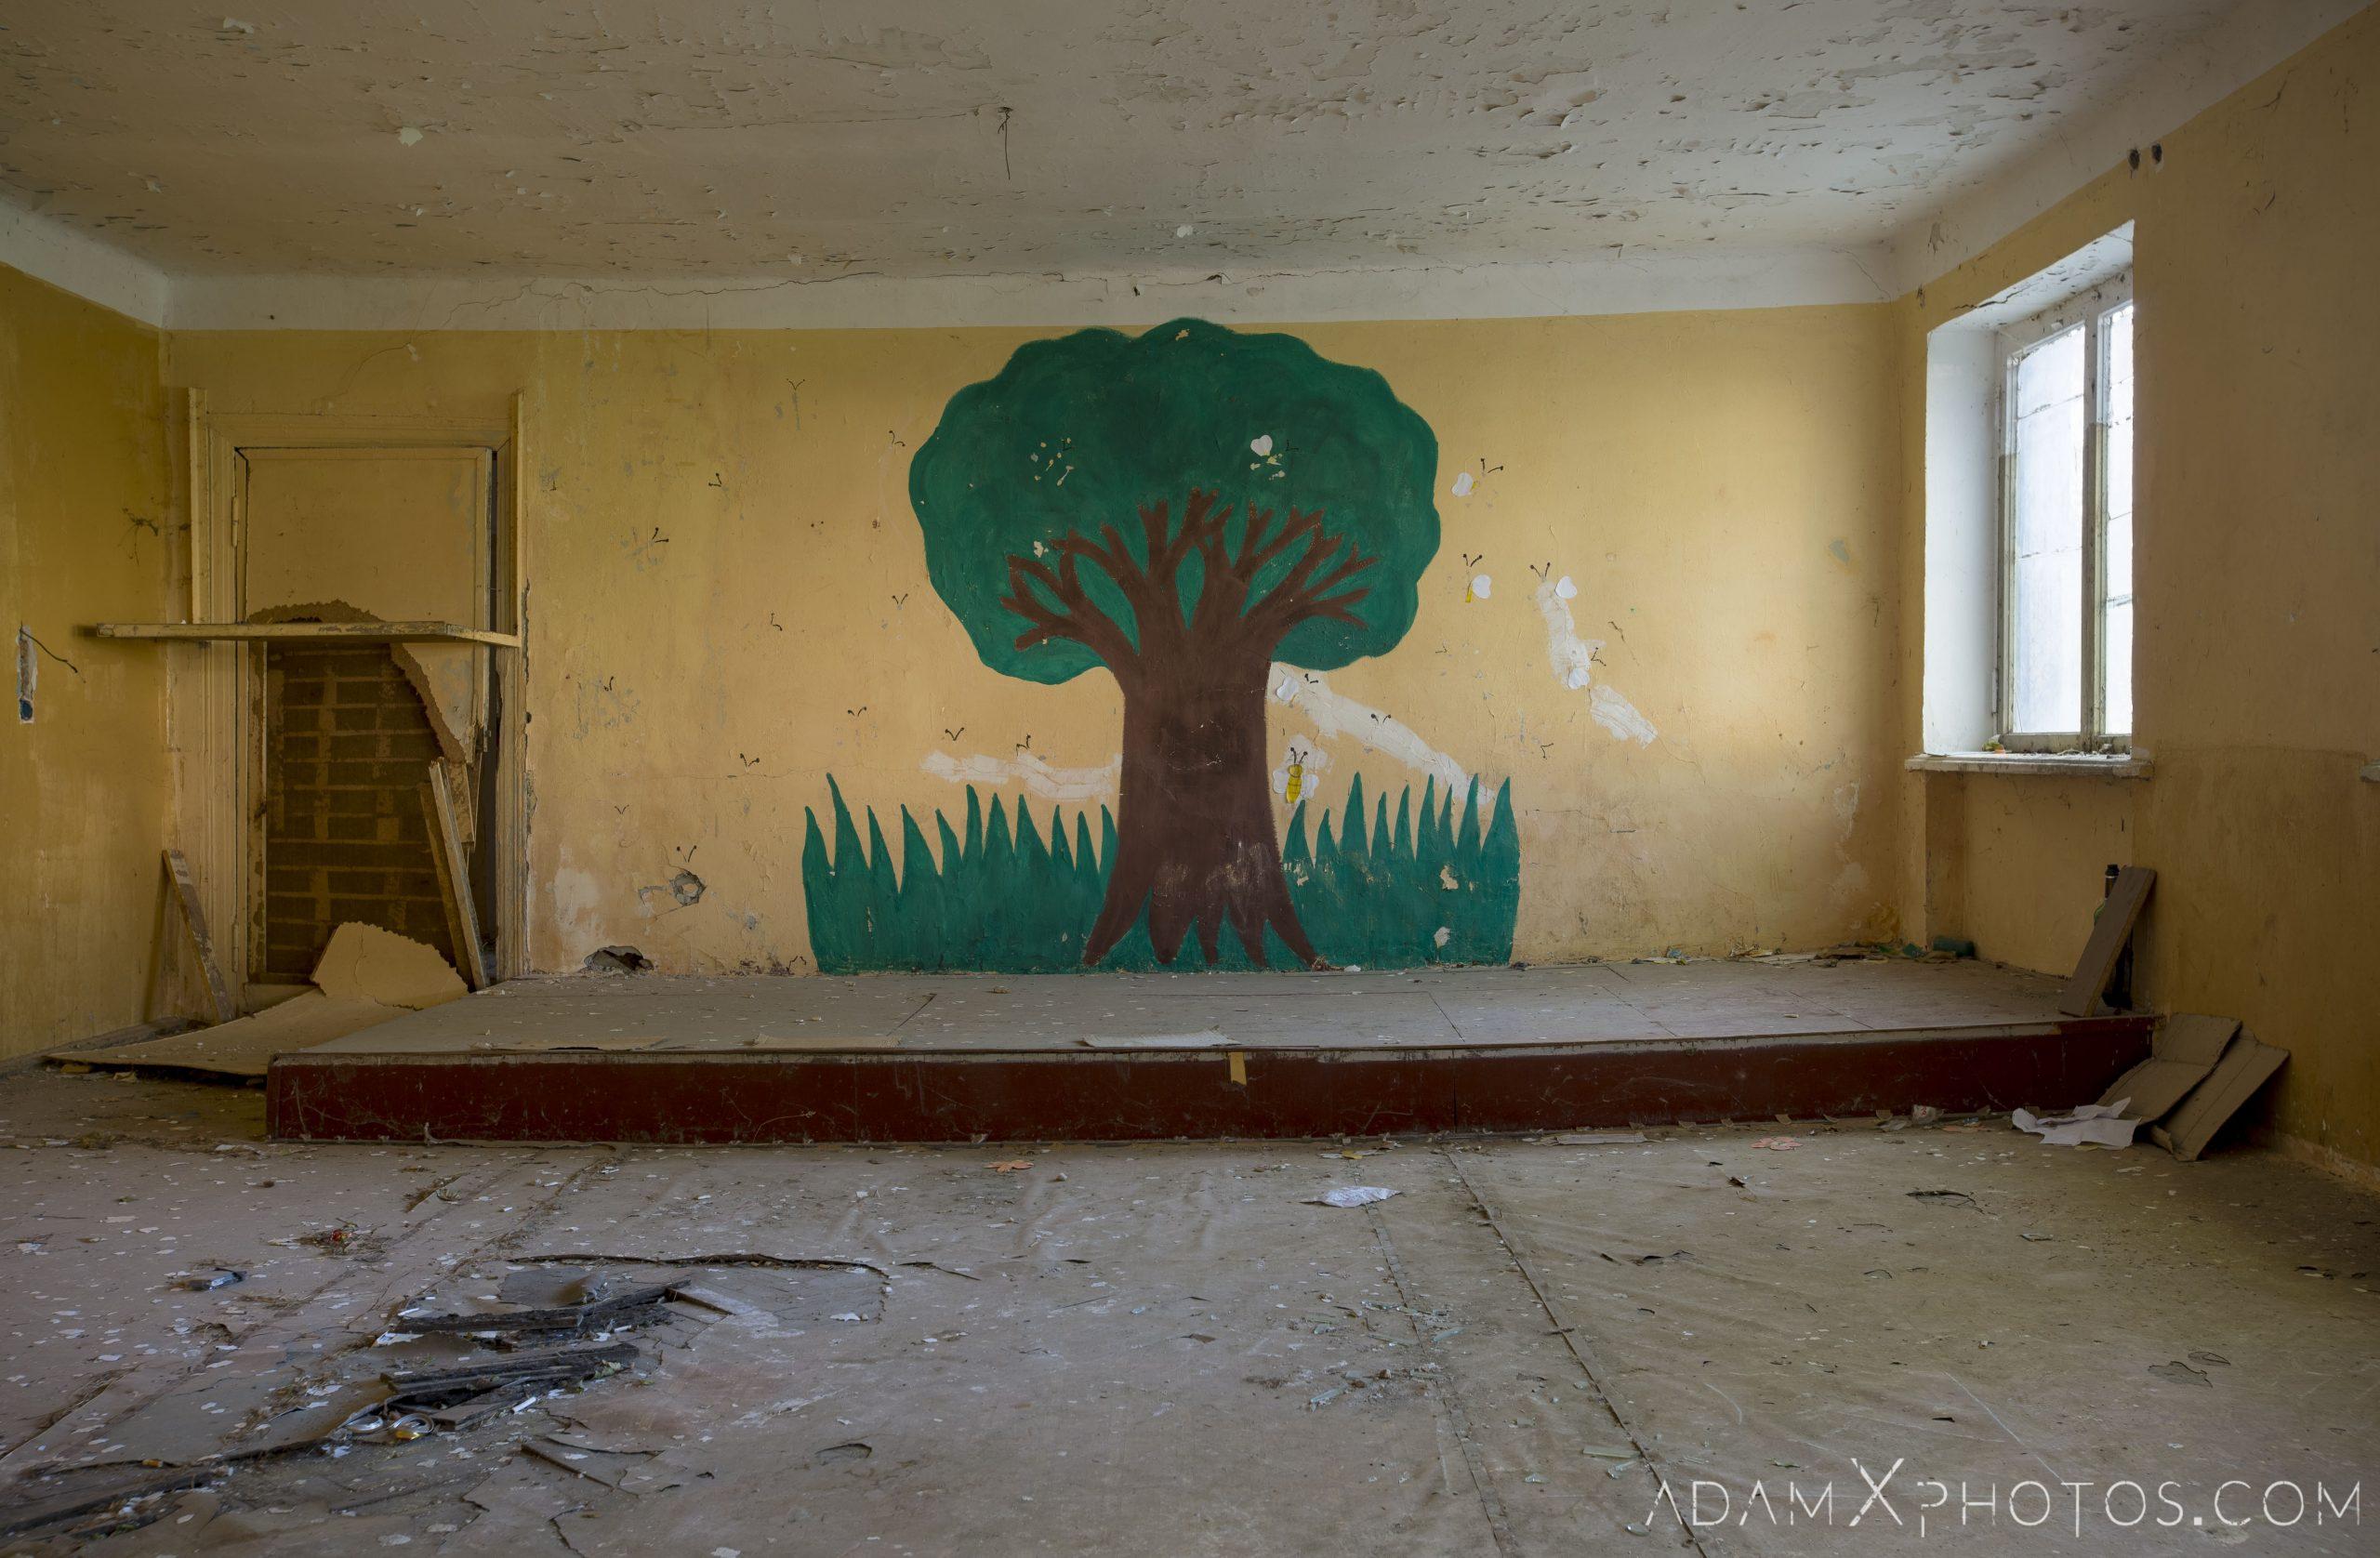 tree painting classroom Abandoned School rural Soviet era Georgia Adam X AdamXPhotos Urbex Urban Exploration 2018 2019 Abandoned Access History decay ruins lost forgotten derelict location creepy haunting eerie security